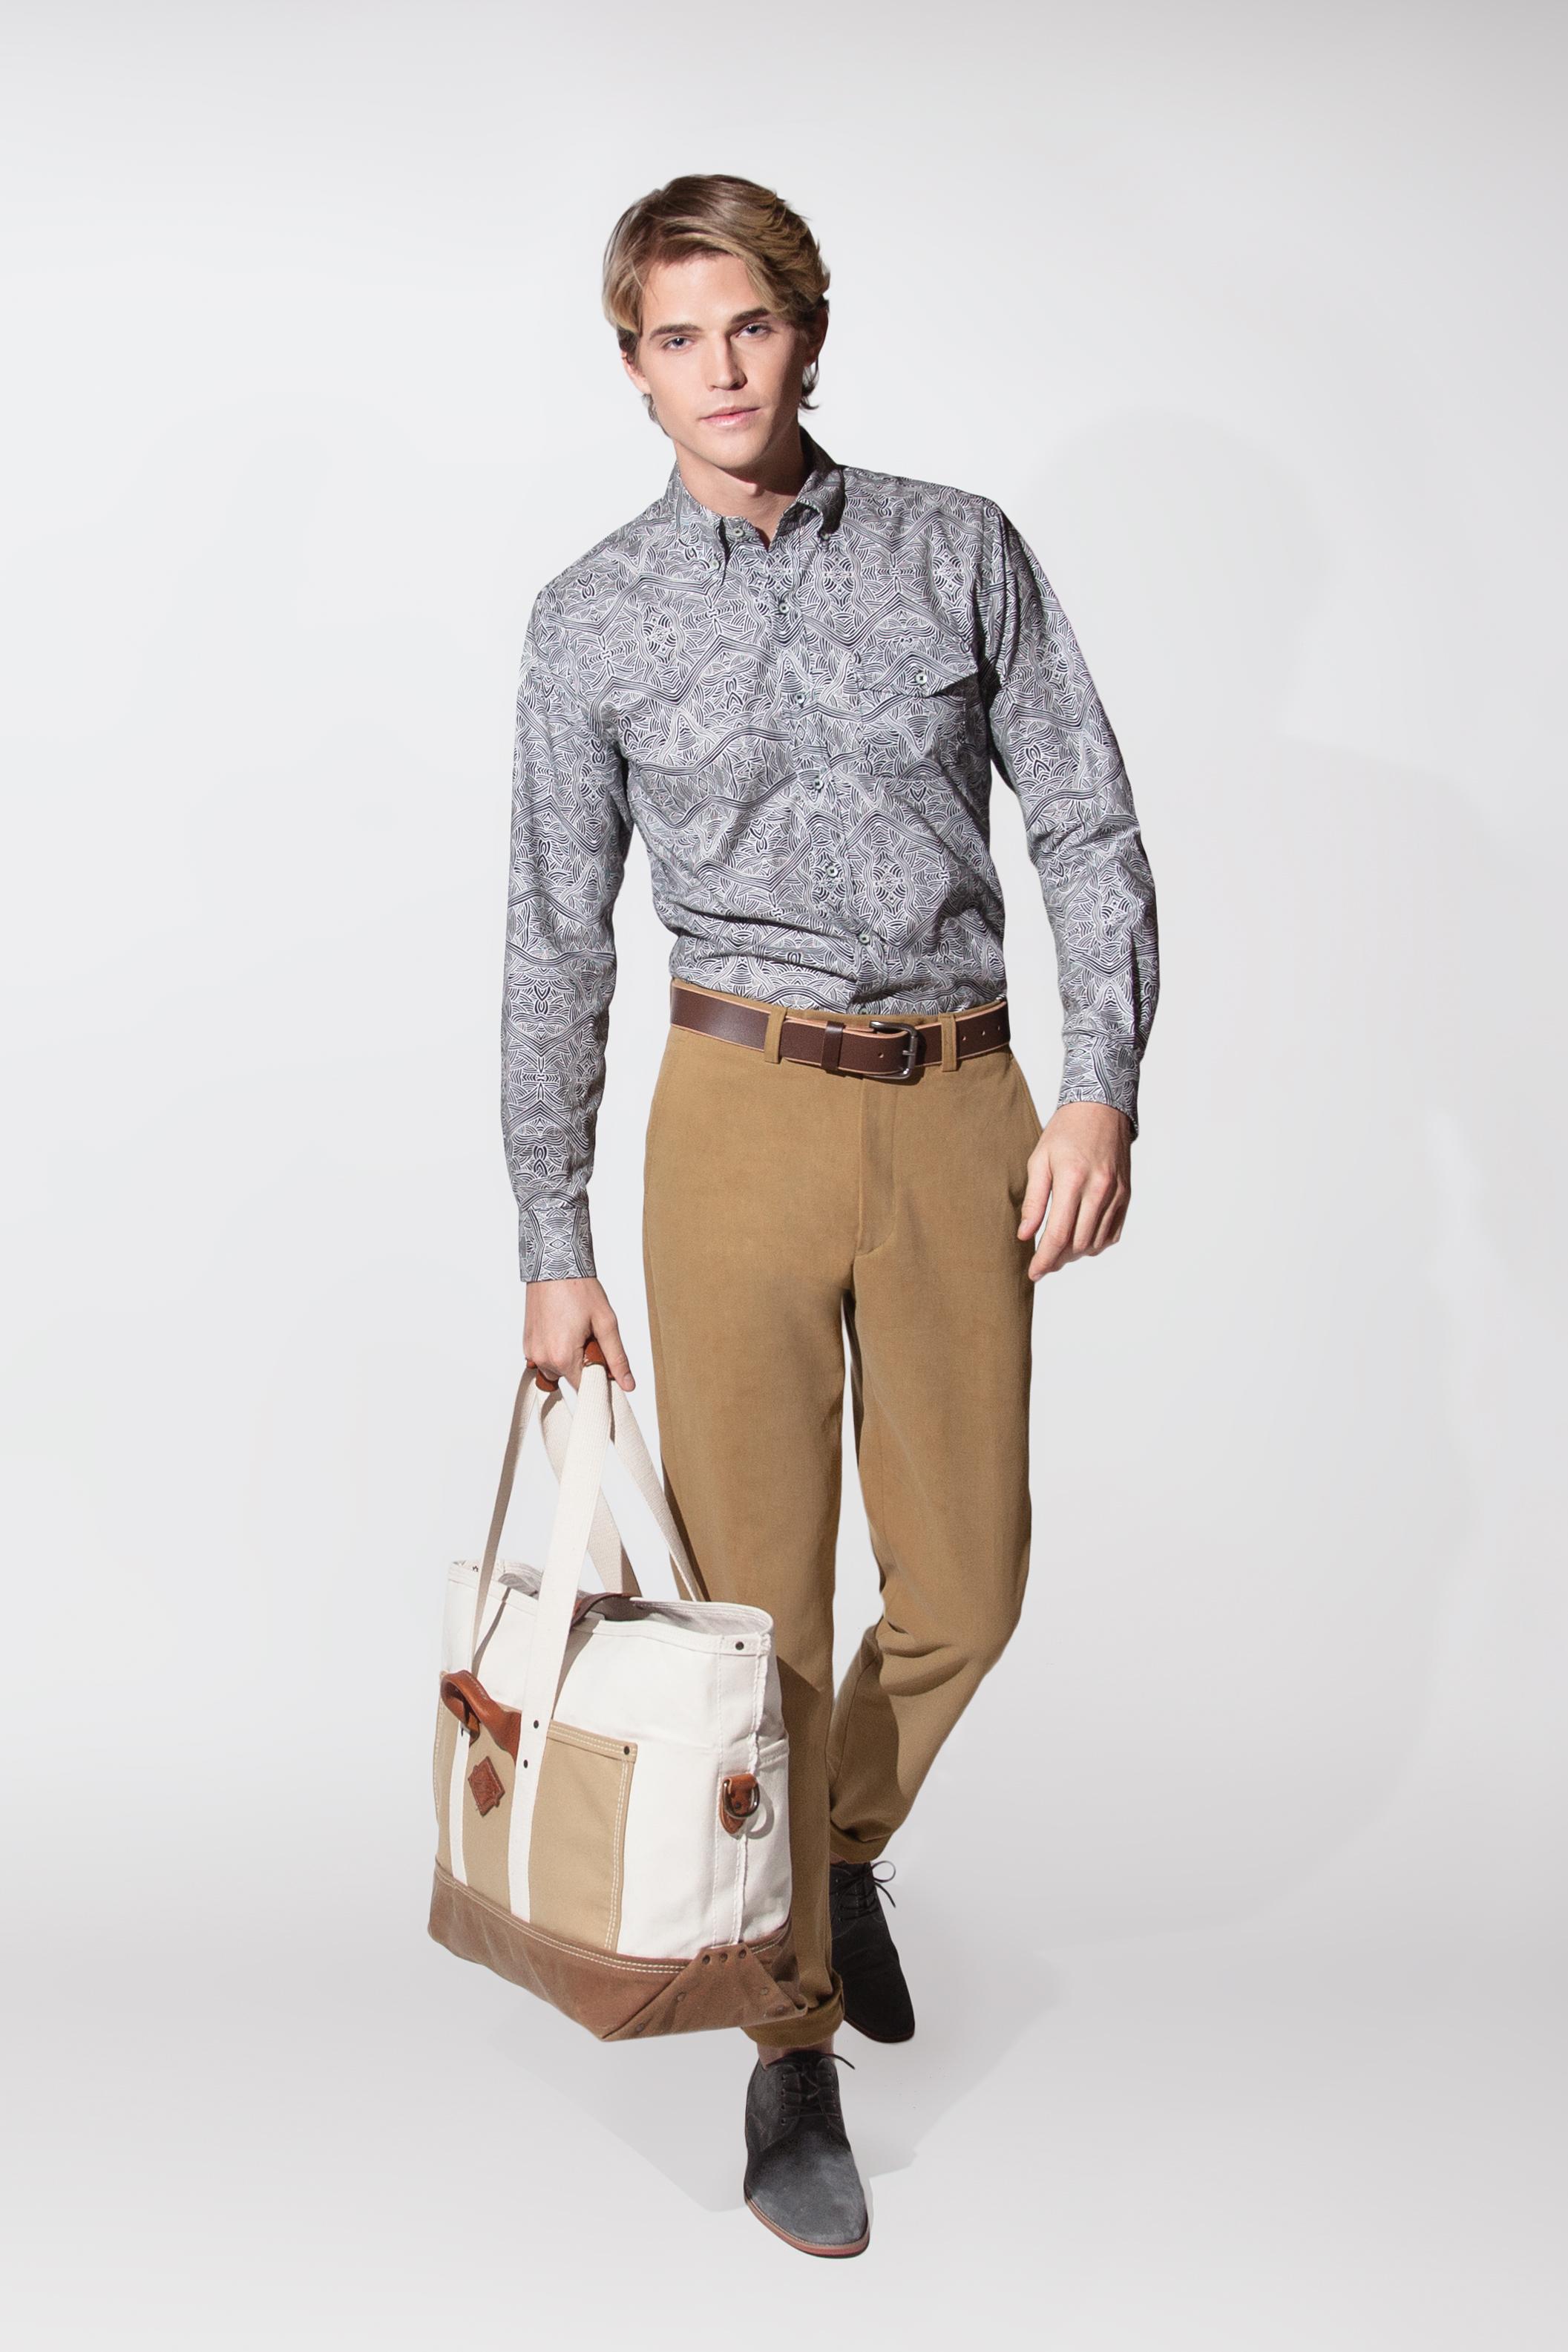 Boston Bag Co. tote $225